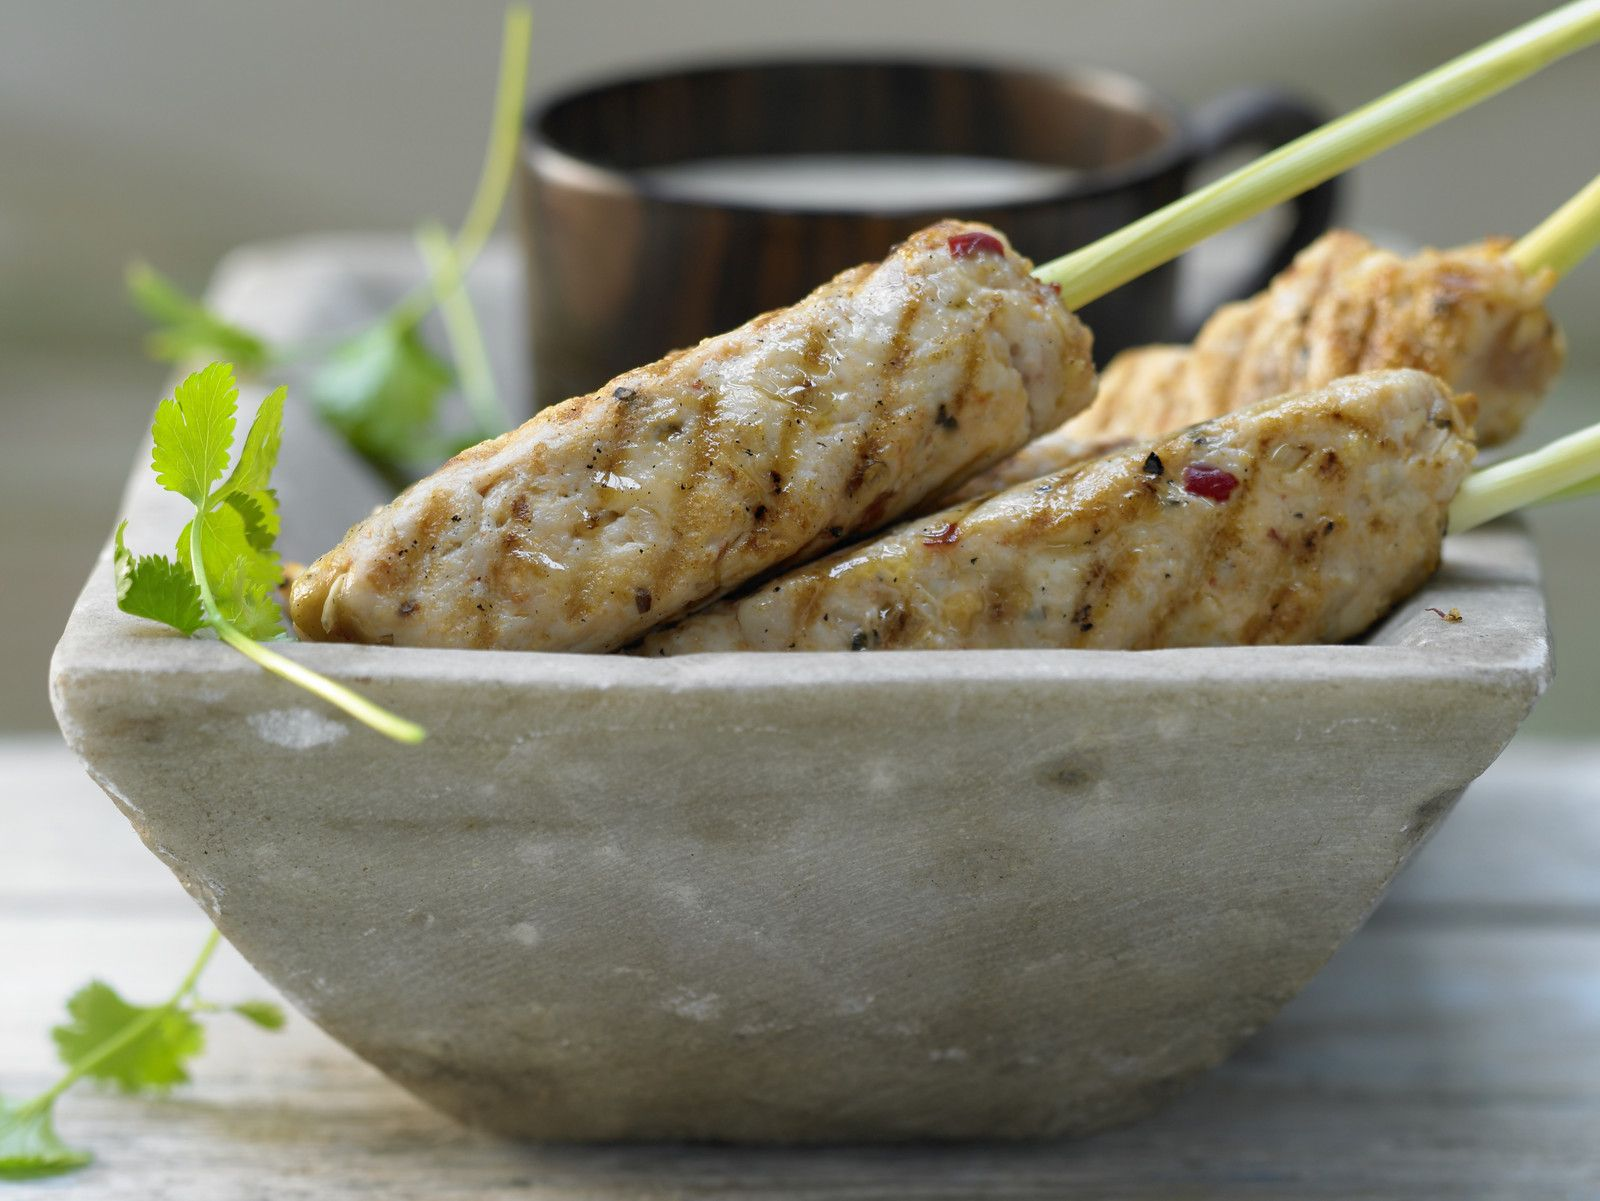 Rezepte Für Gasgrill Mit Haube : Gasgrill rezepte eat smarter